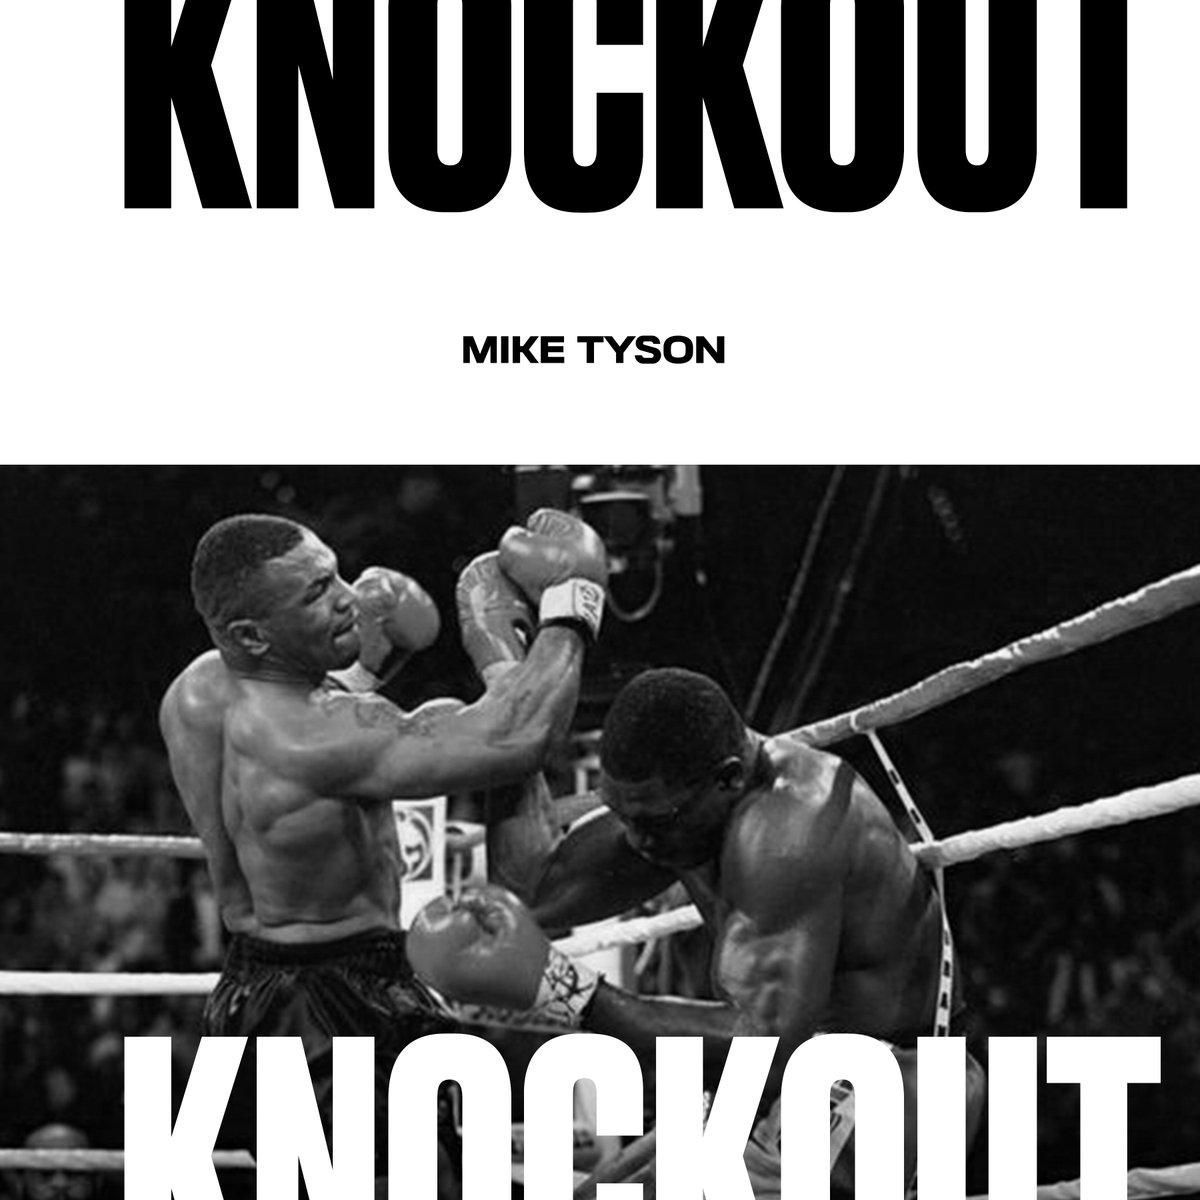 That knockout feeling you get when it's the weekend  #miketyson #TGIF https://t.co/yrBaWCzTfu